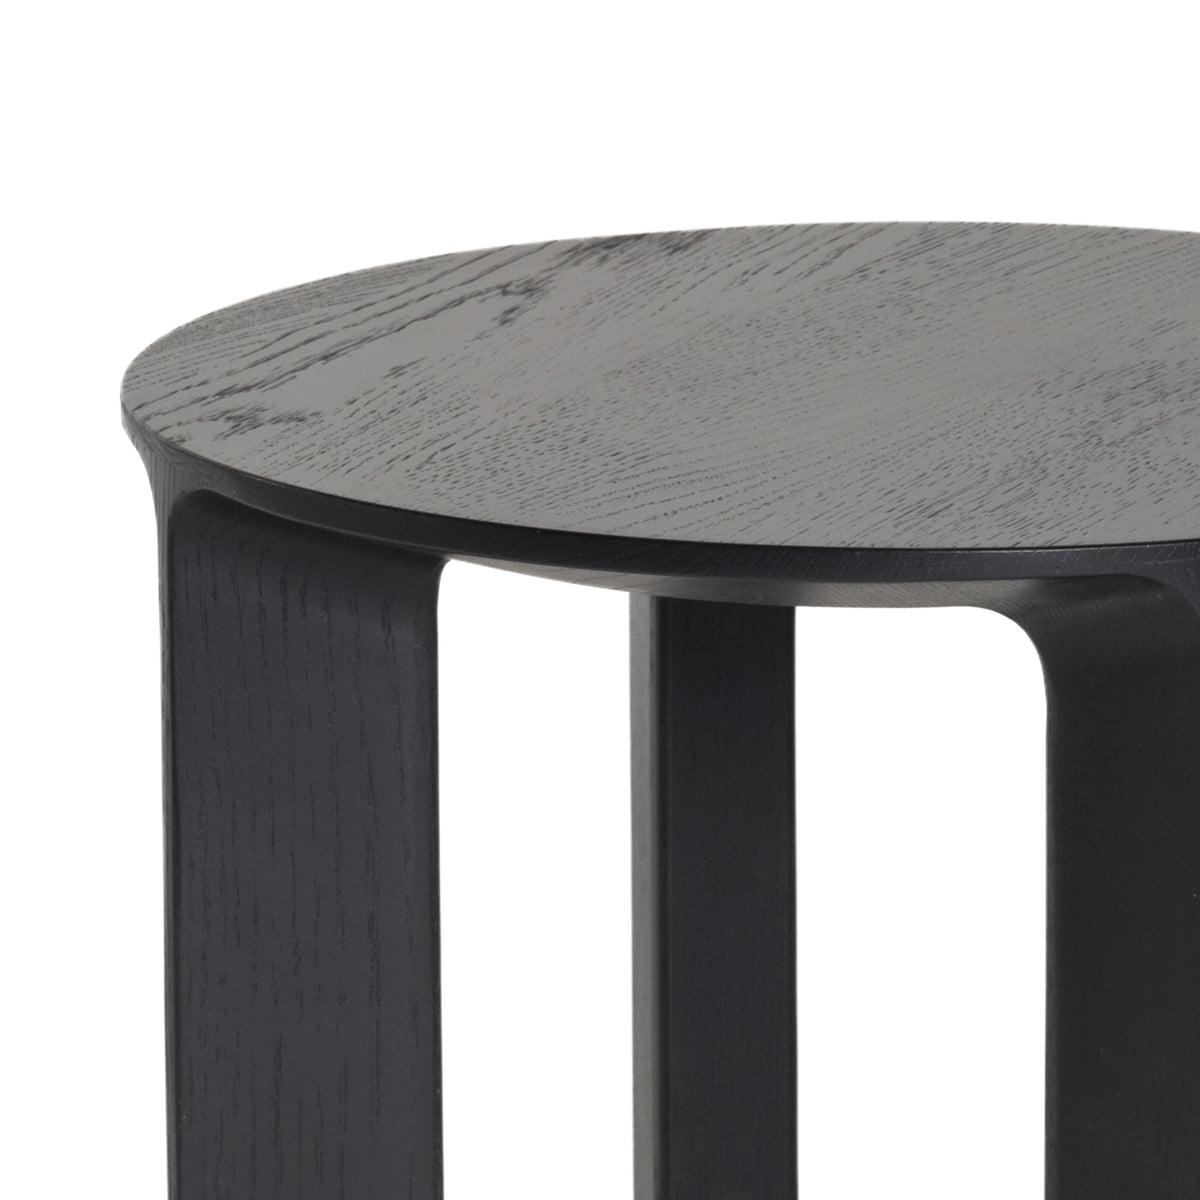 Outdoor Hocker hans stool side table by schönbuch